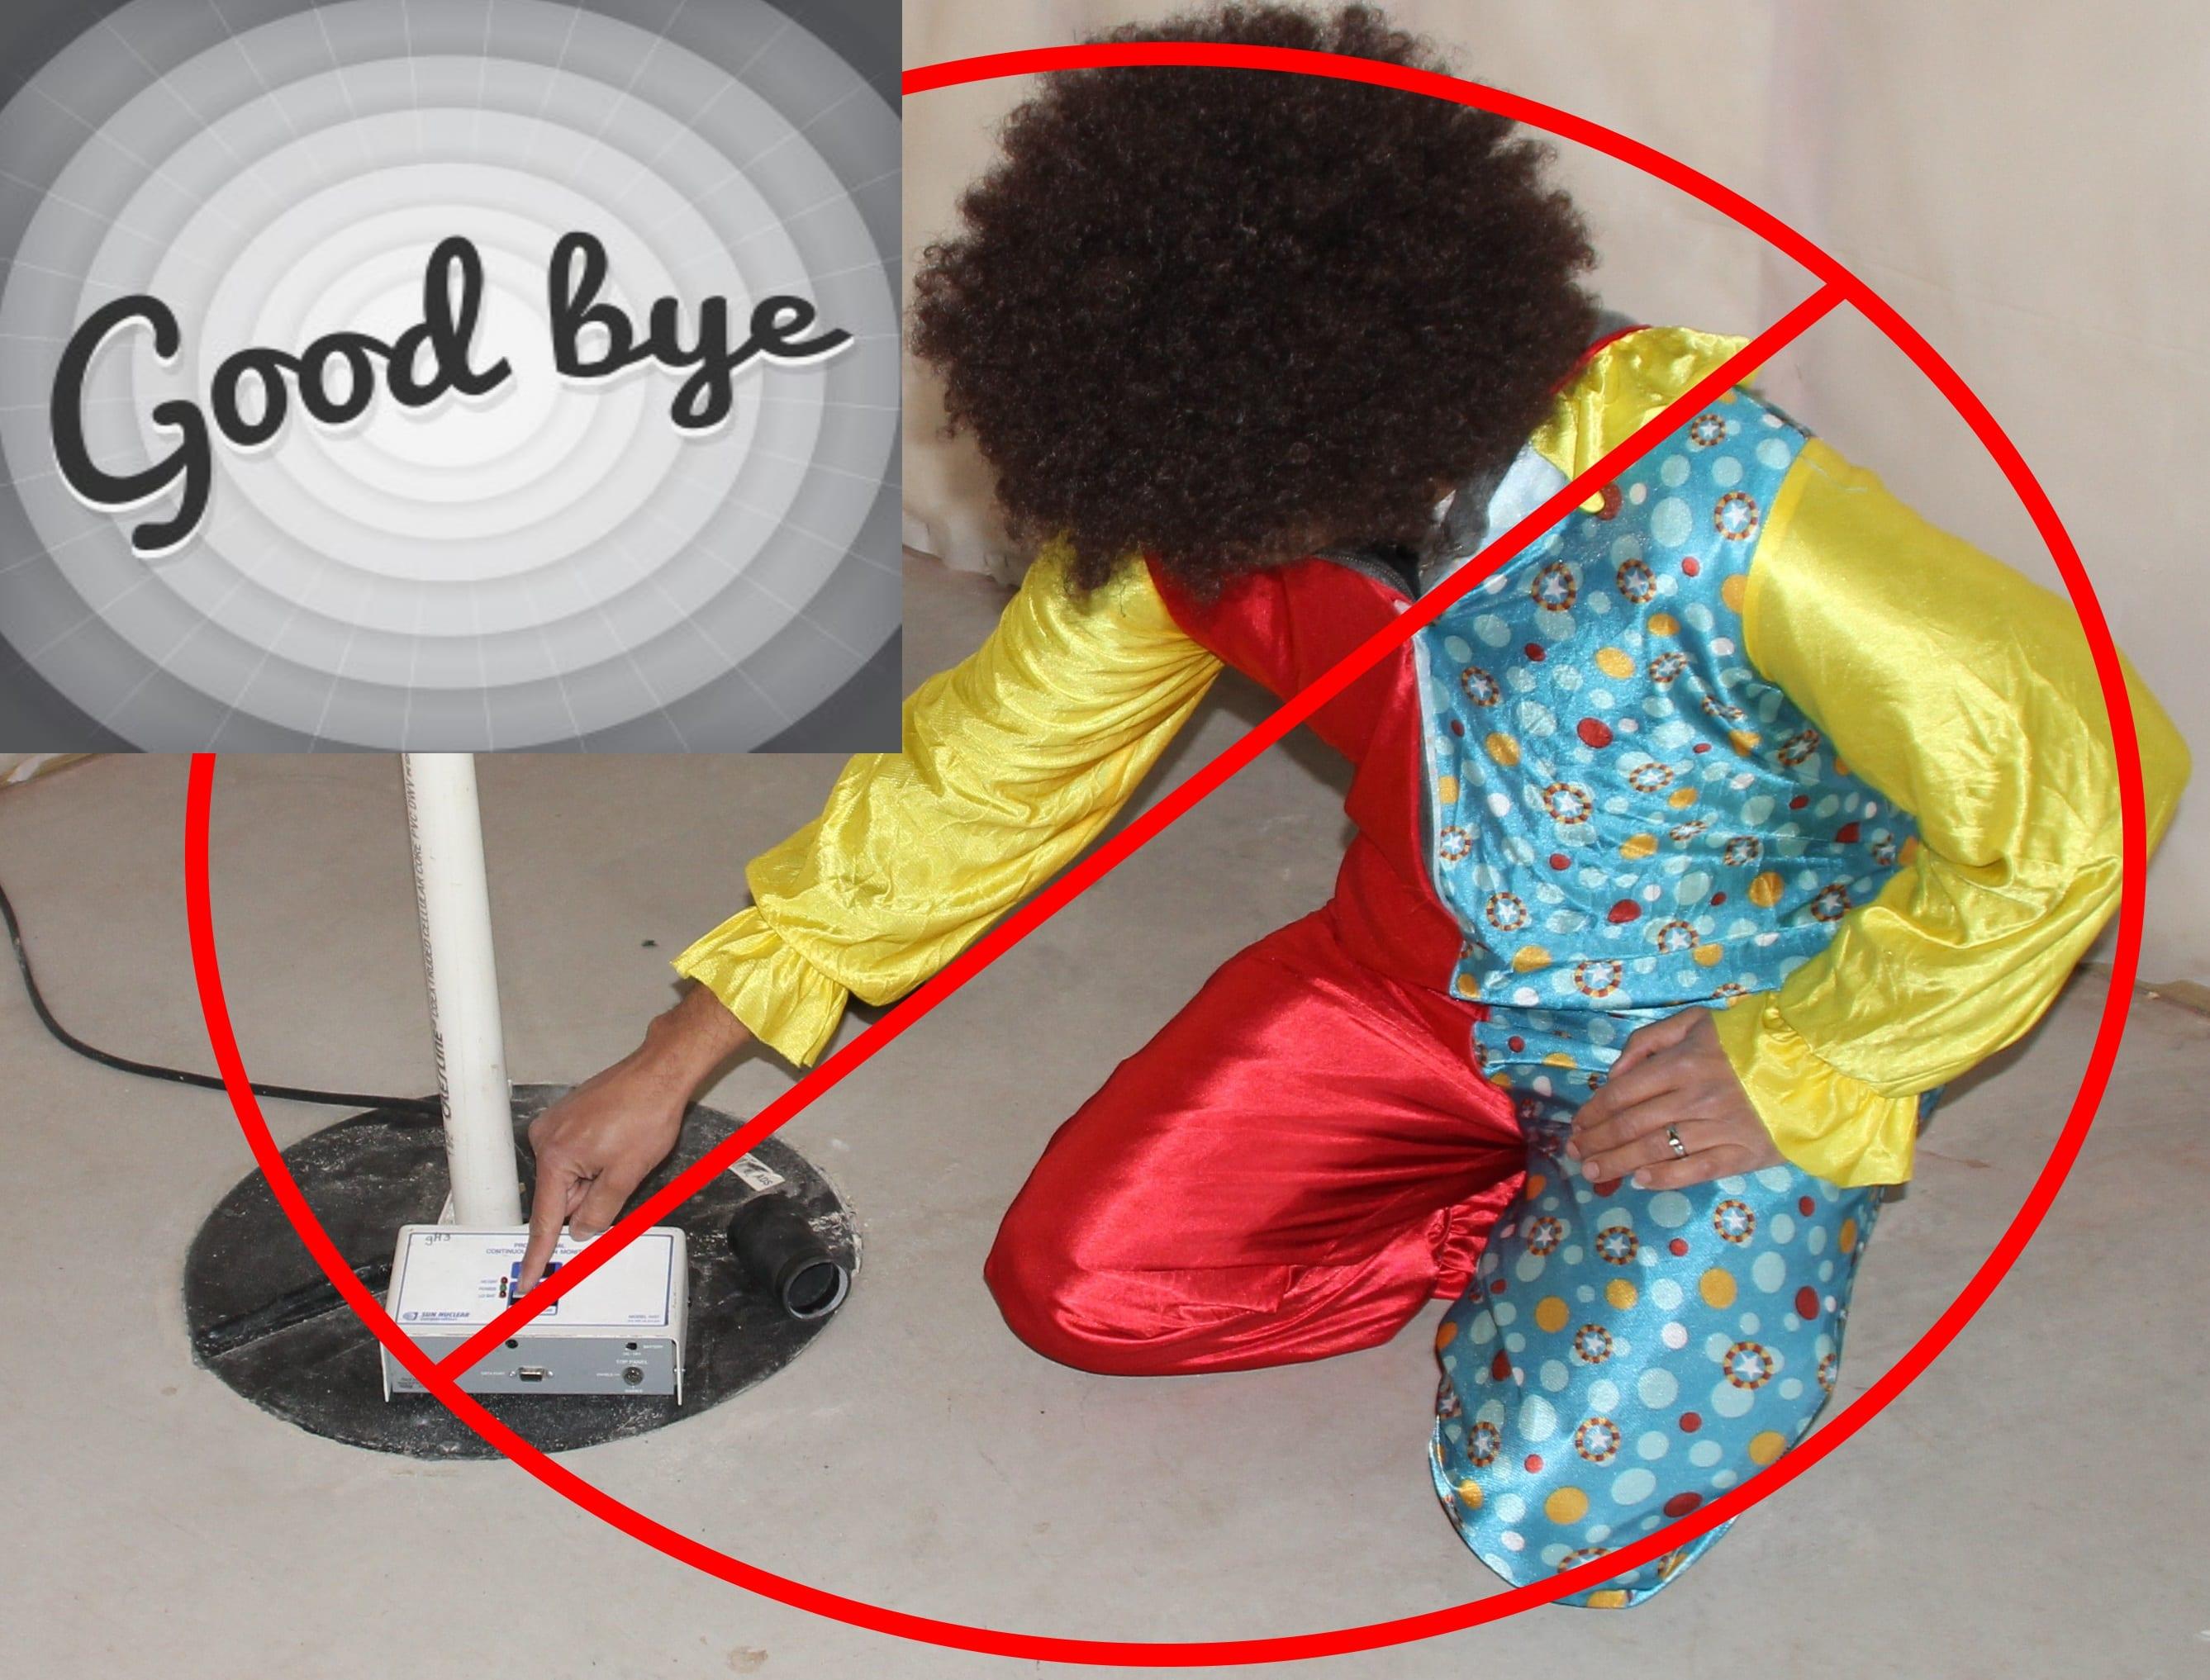 Radon-Clown-Goodbye.jpg